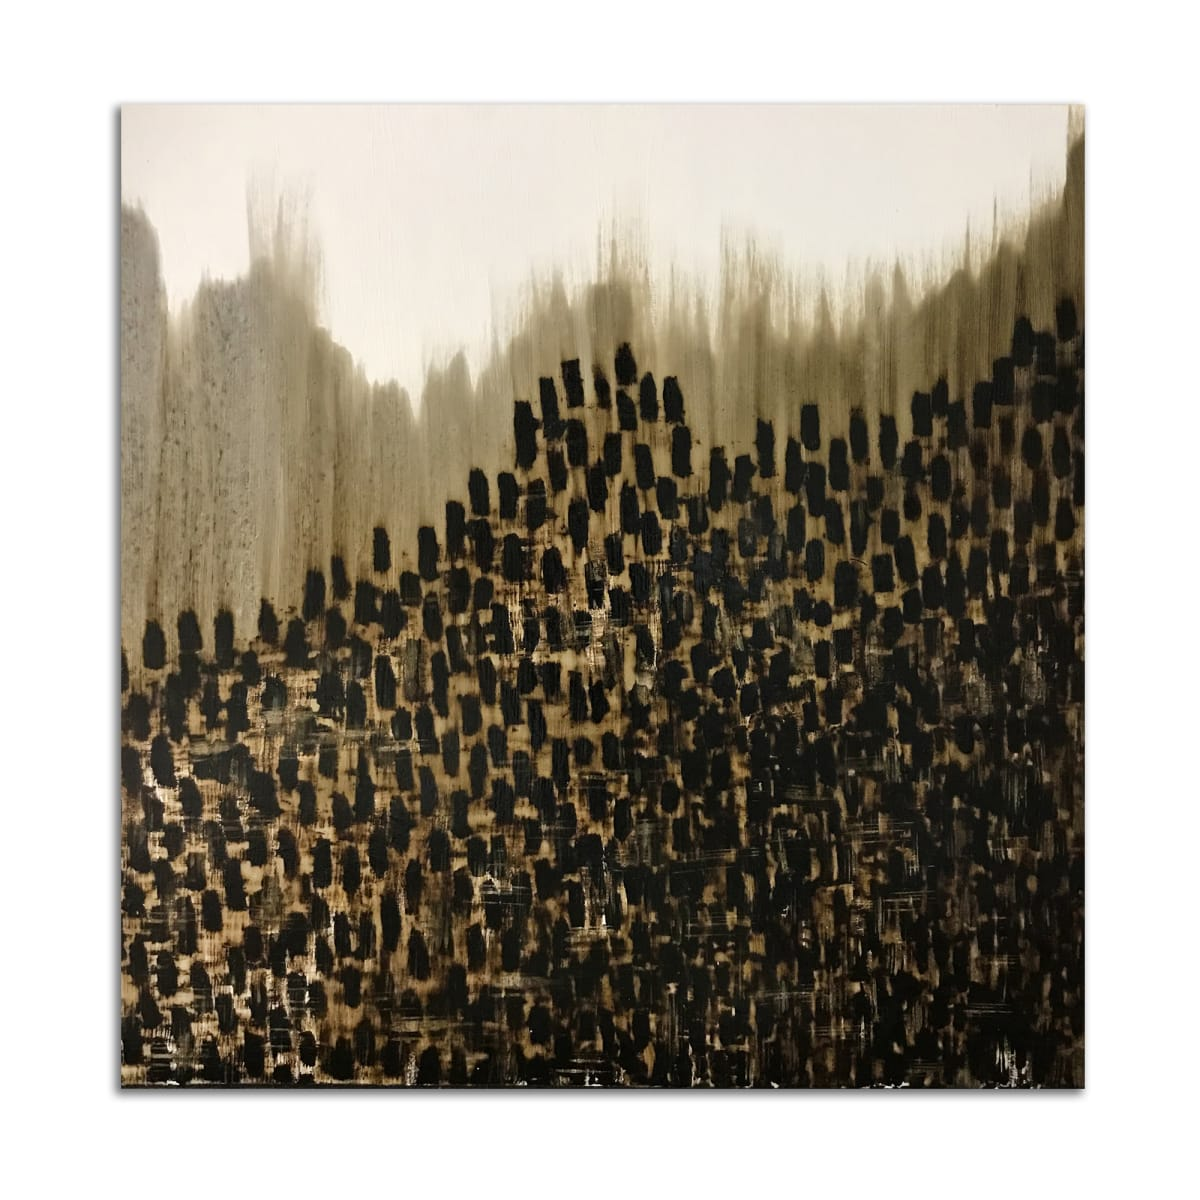 Migration by J. Kent Martin